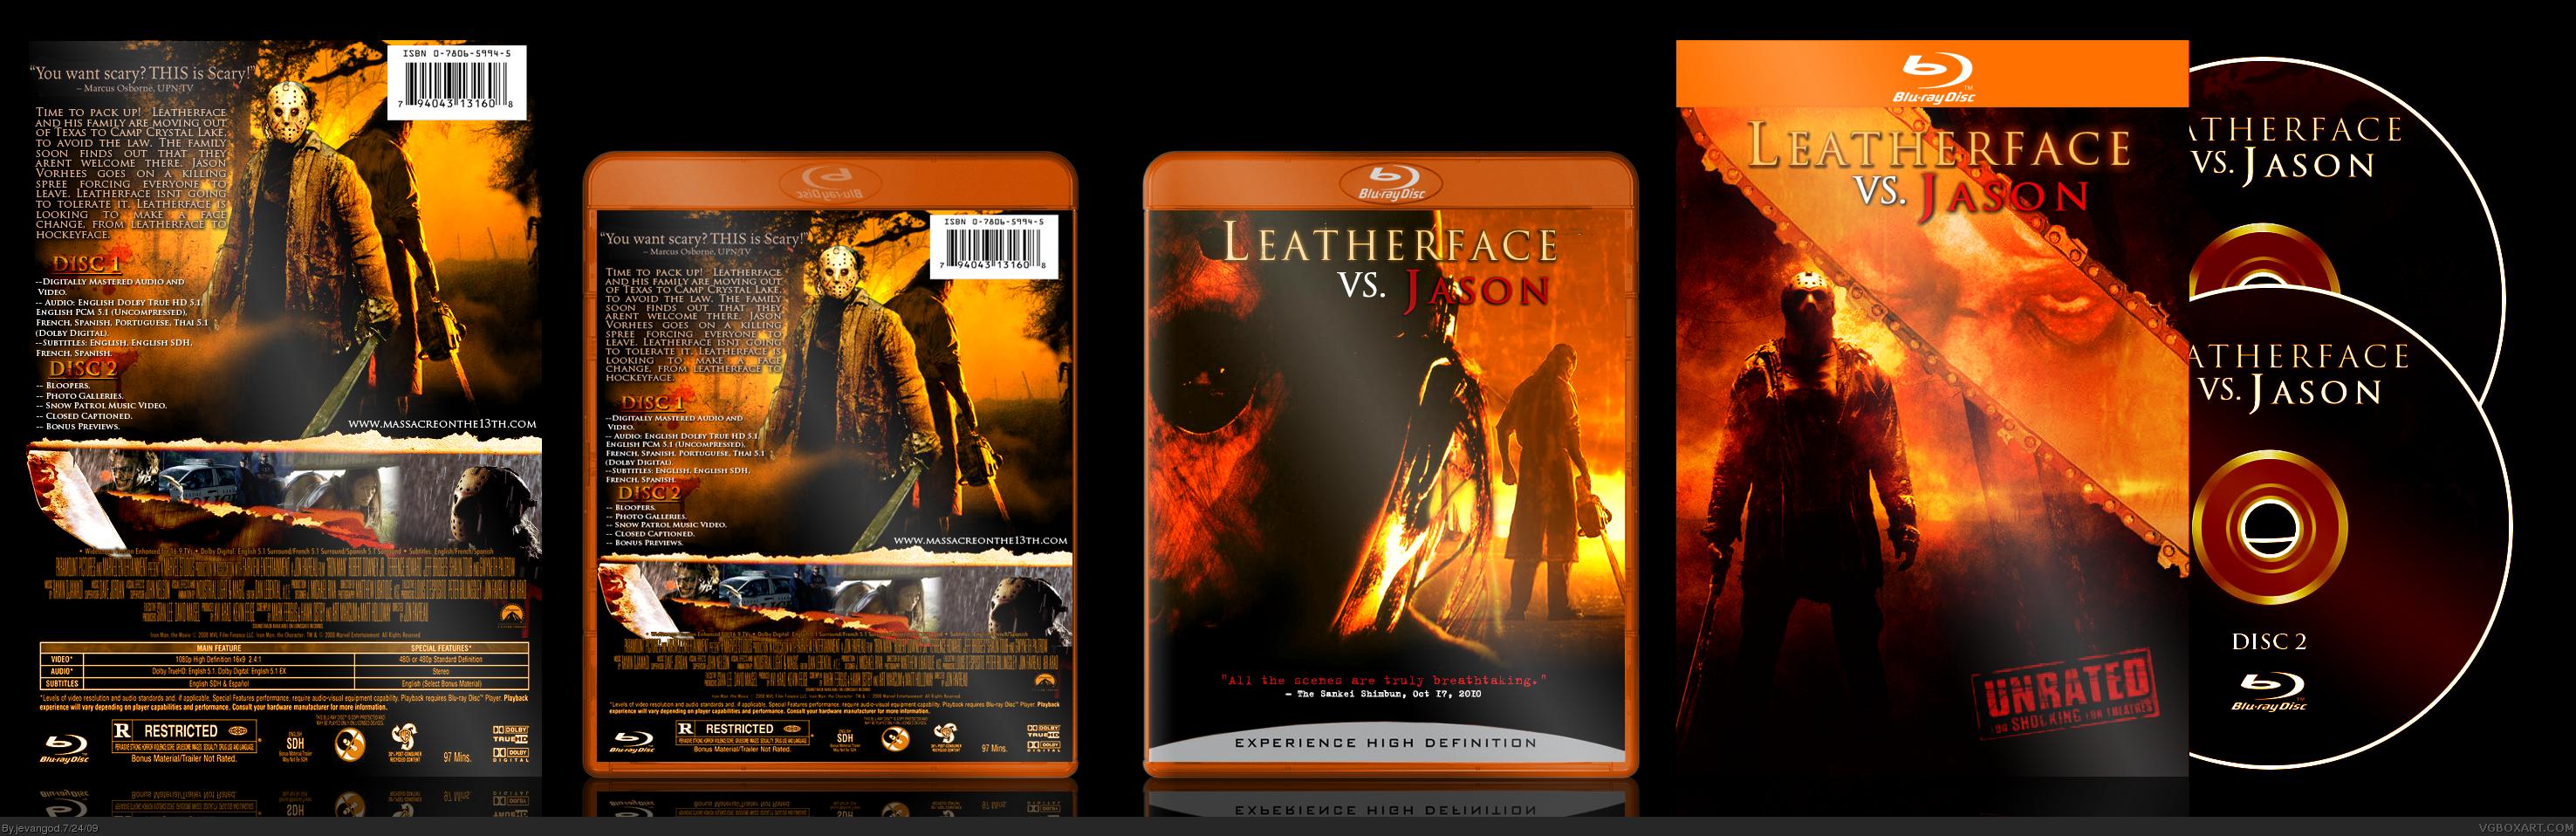 Leatherface Vs Jason